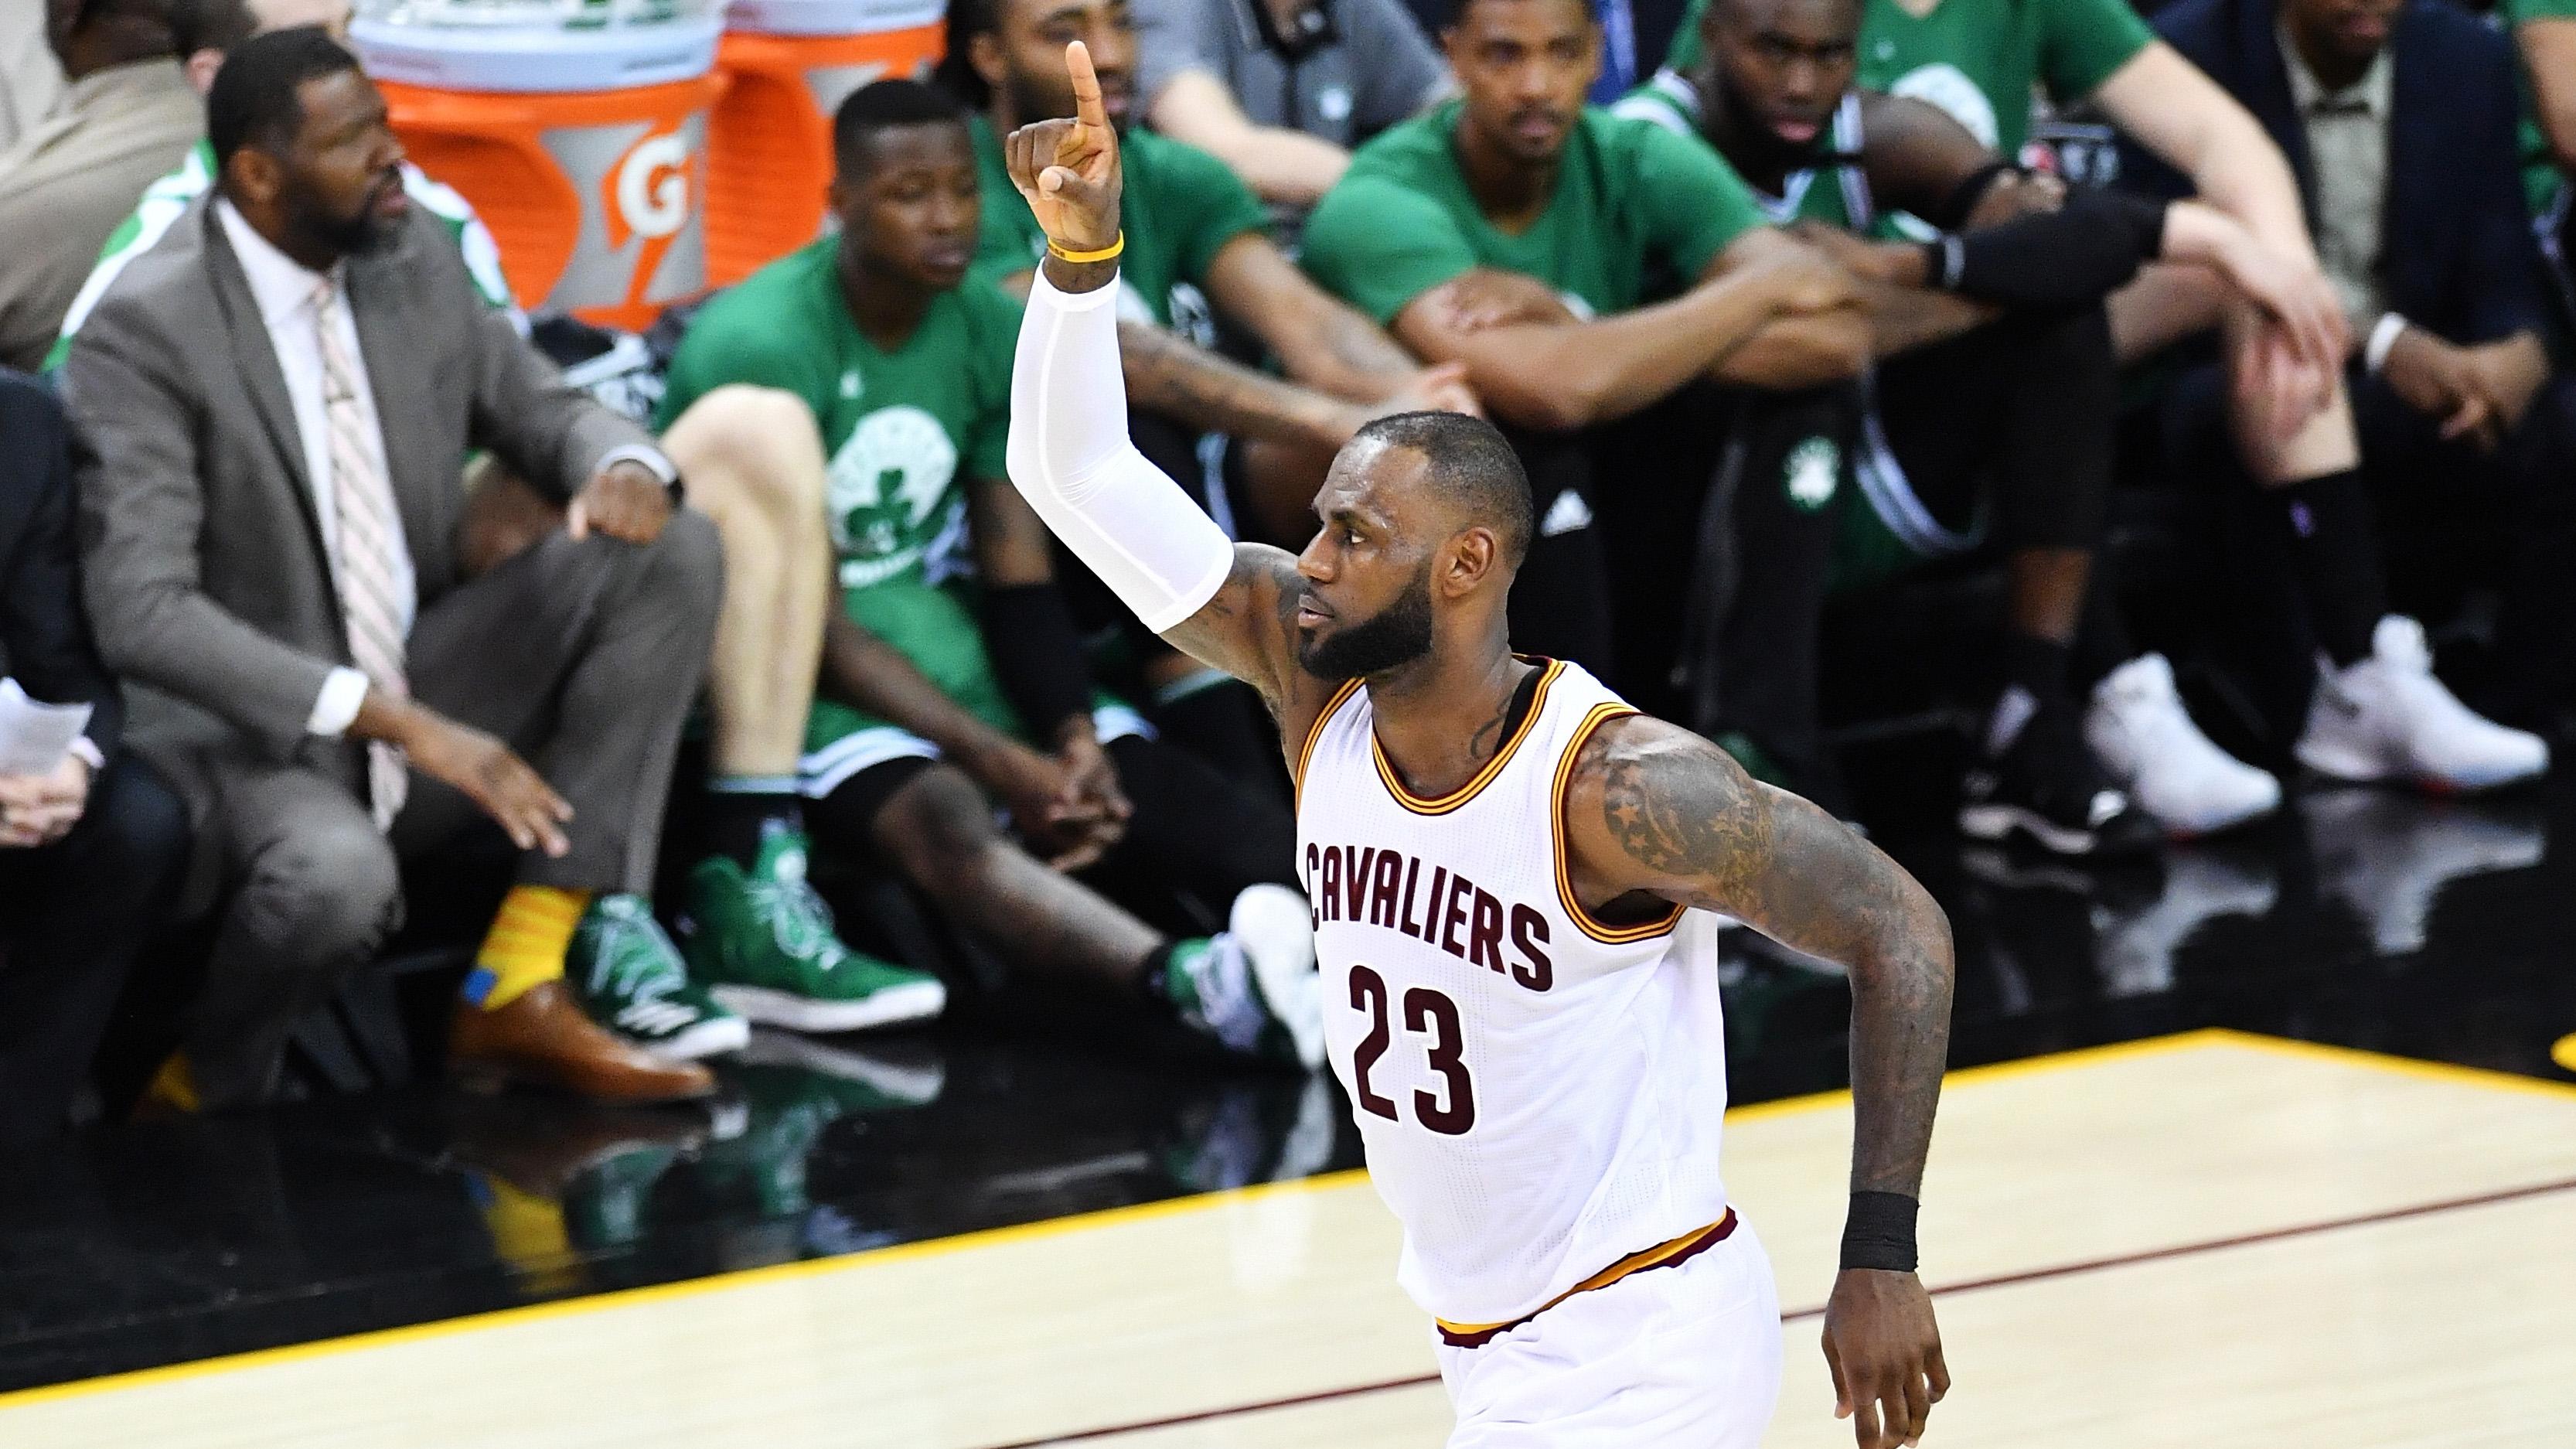 LeBron James needs 28 points to surpass